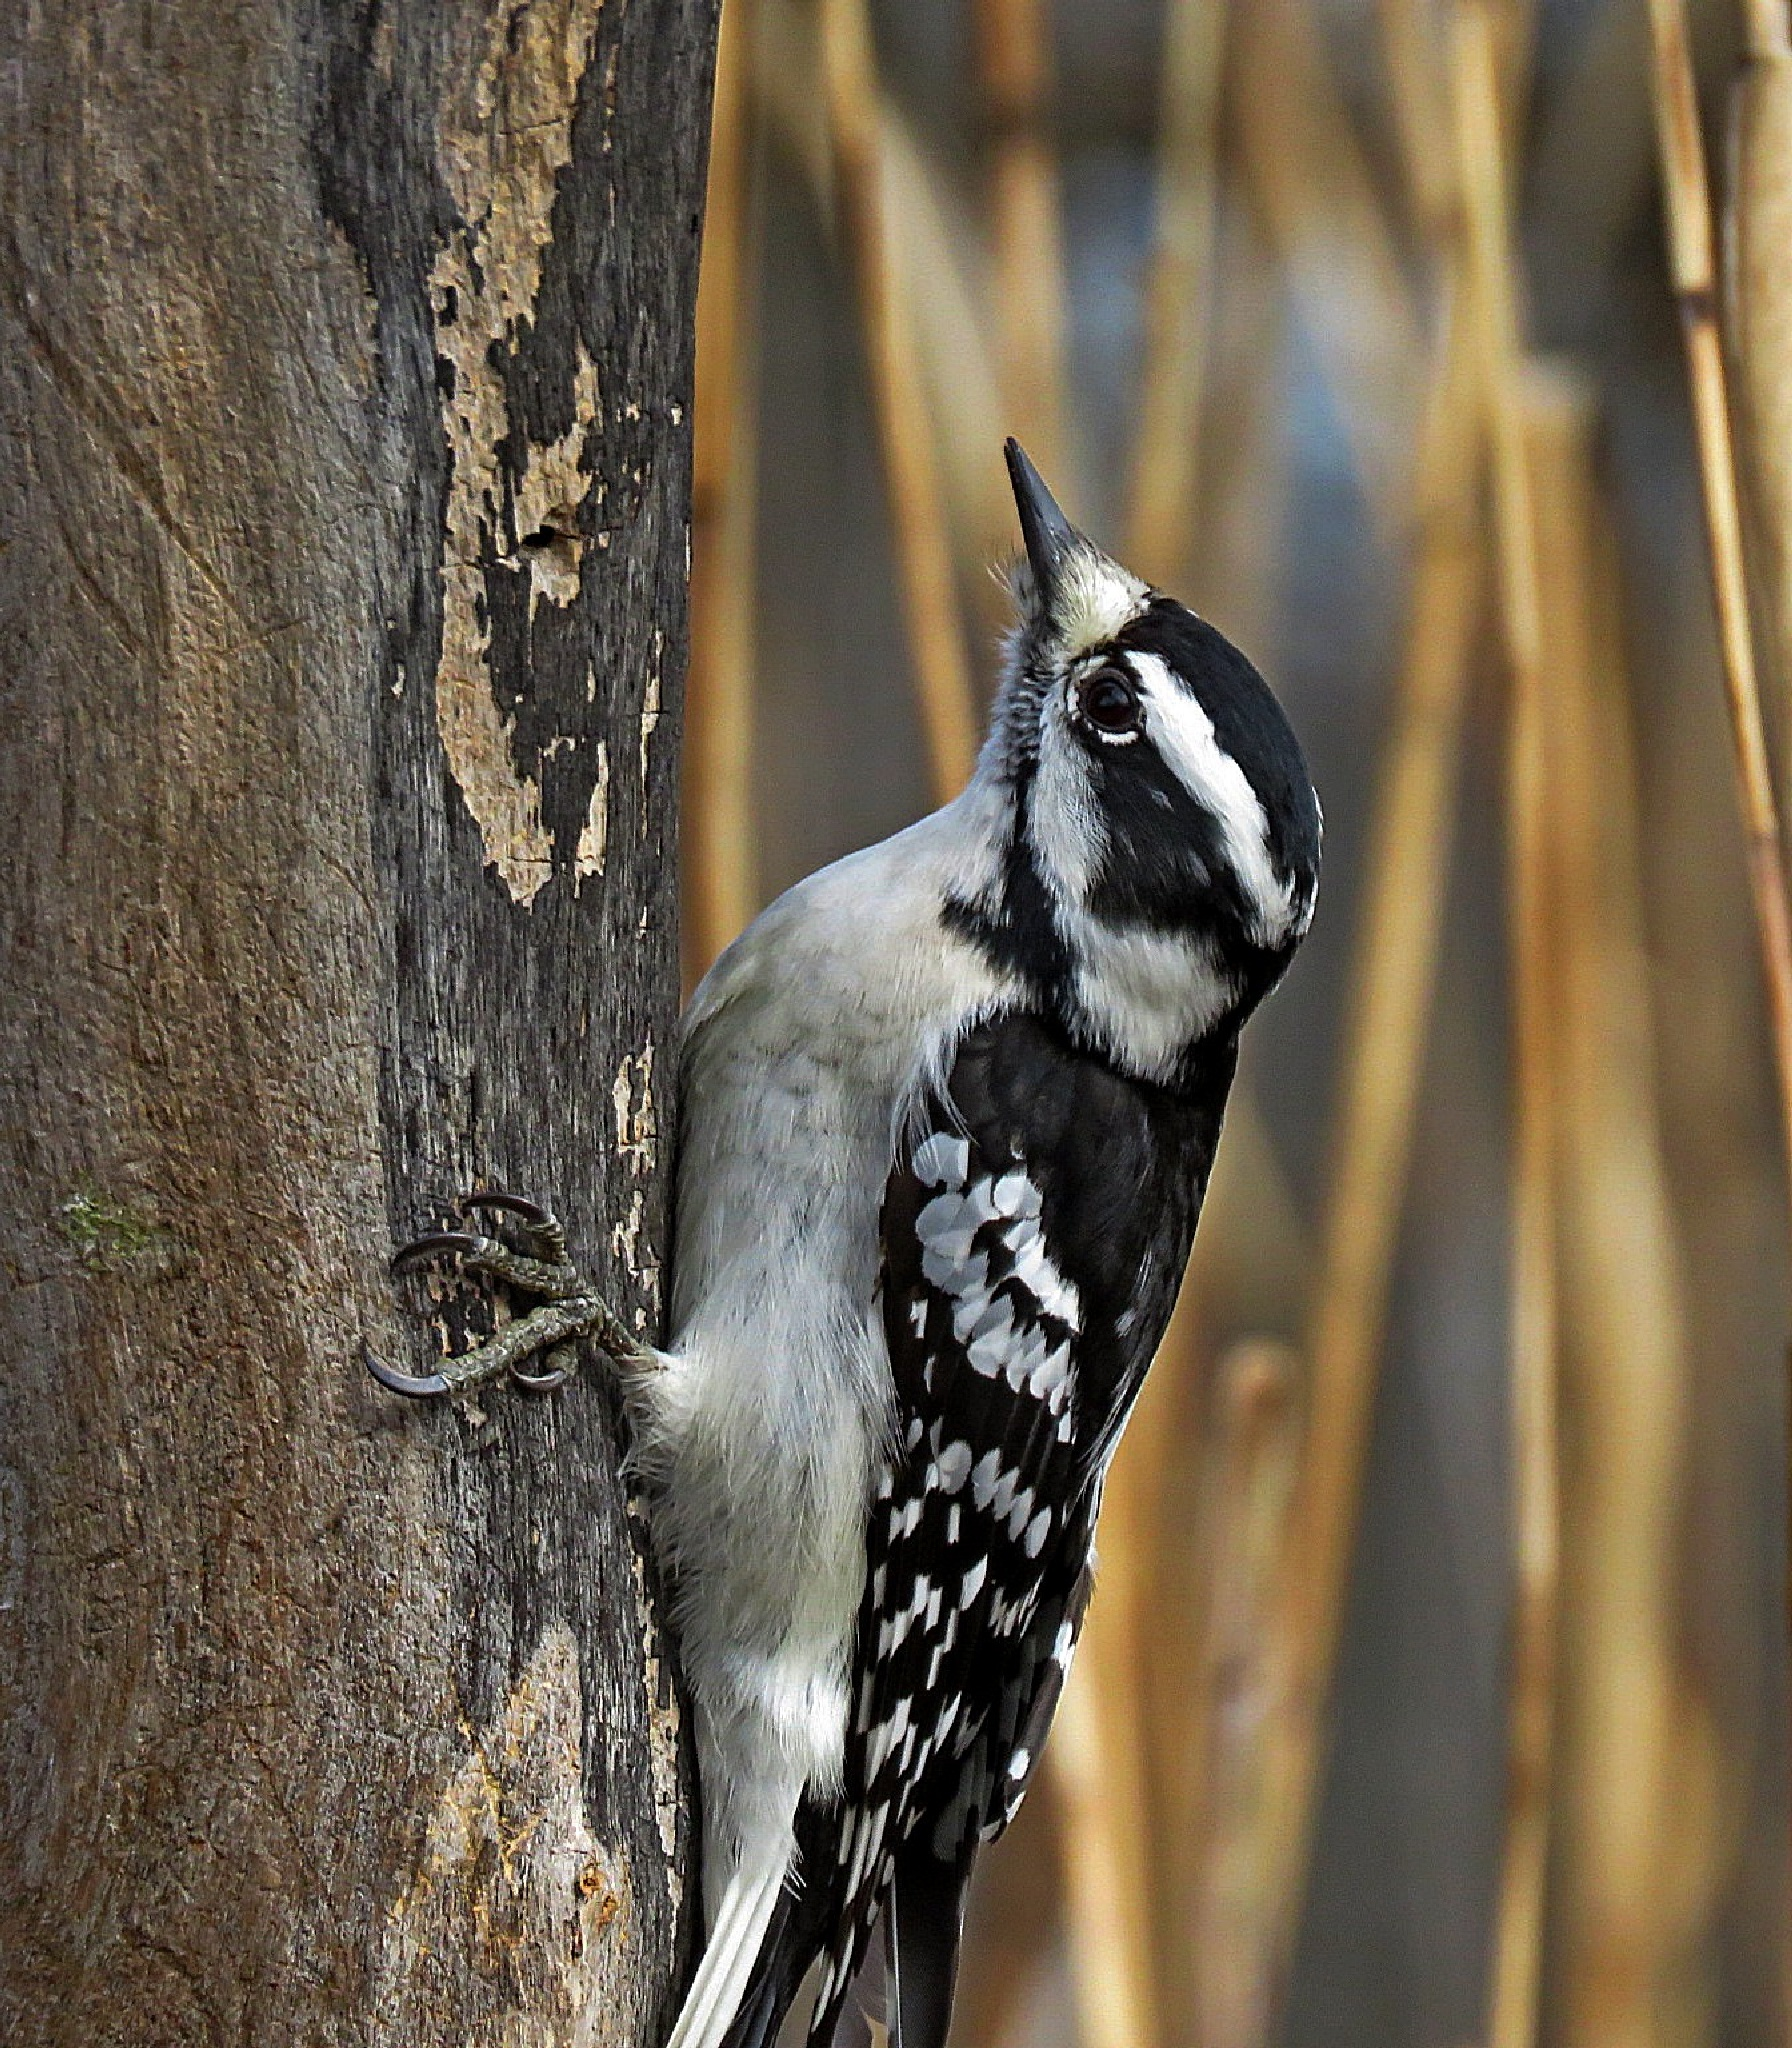 Downy Woodpecker by Wayne T. 'tom' Helfrich